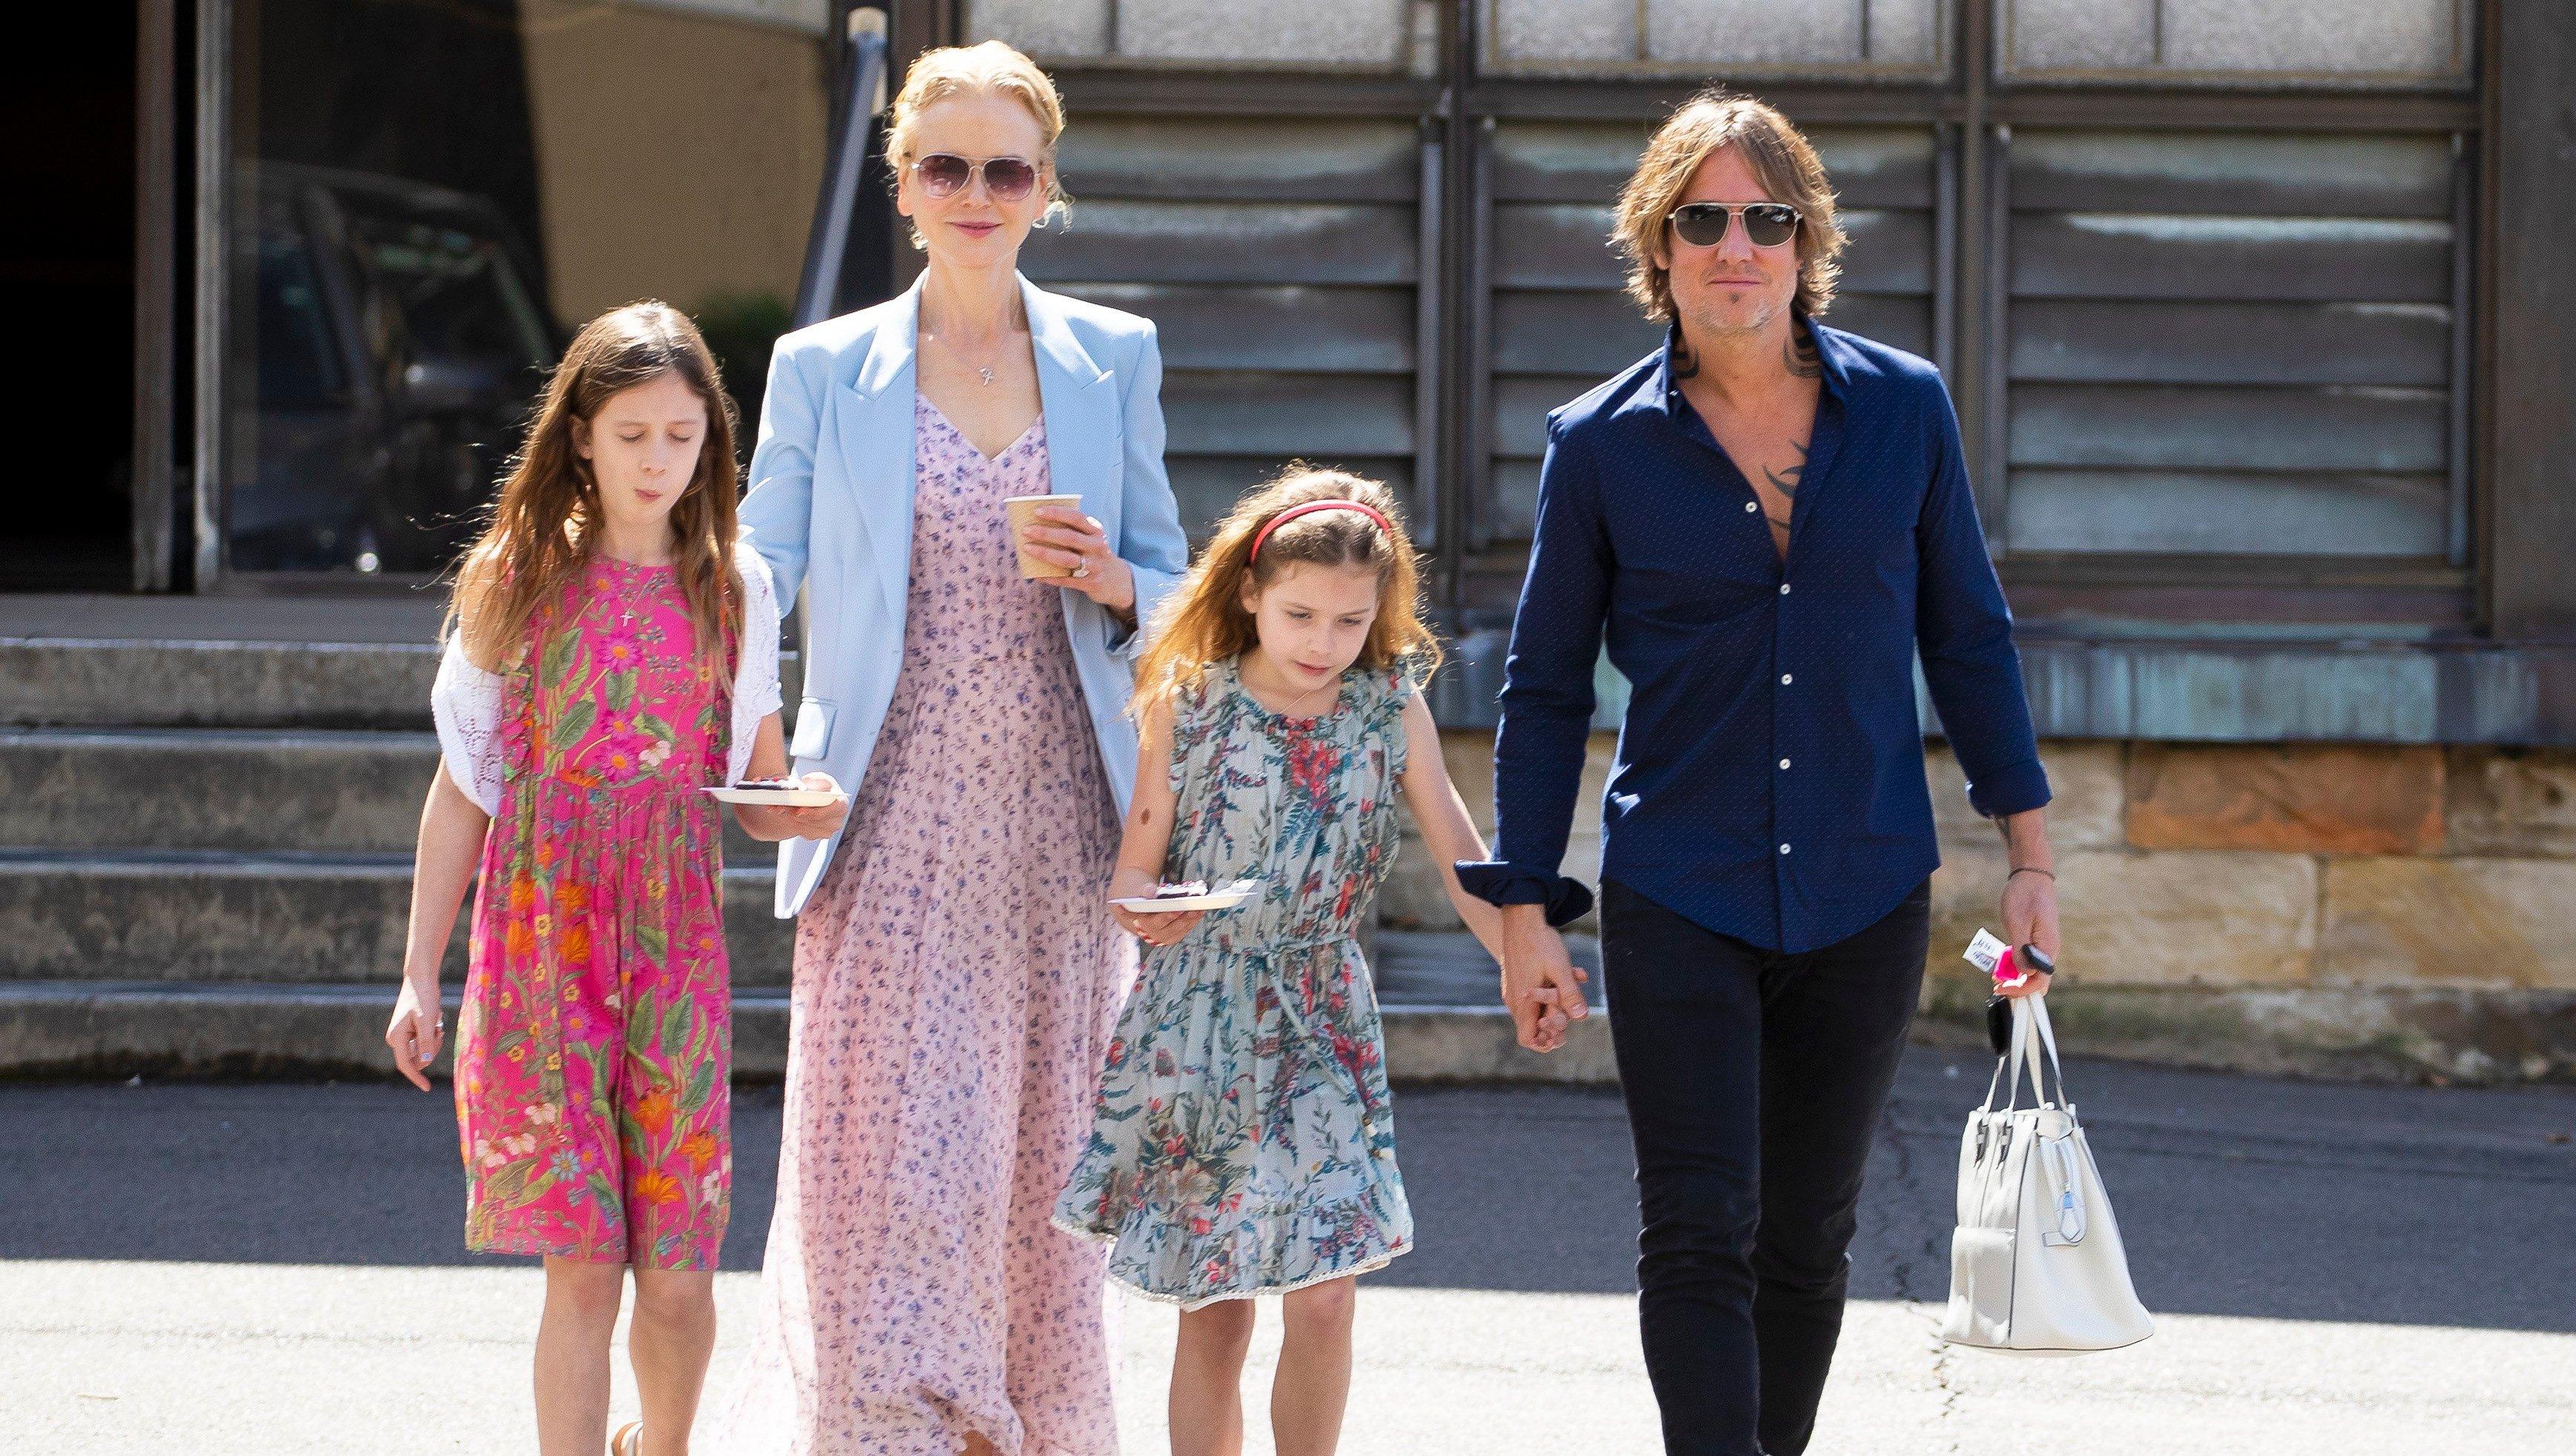 Nicole Kidman, Keith Urban, Kids, Walking